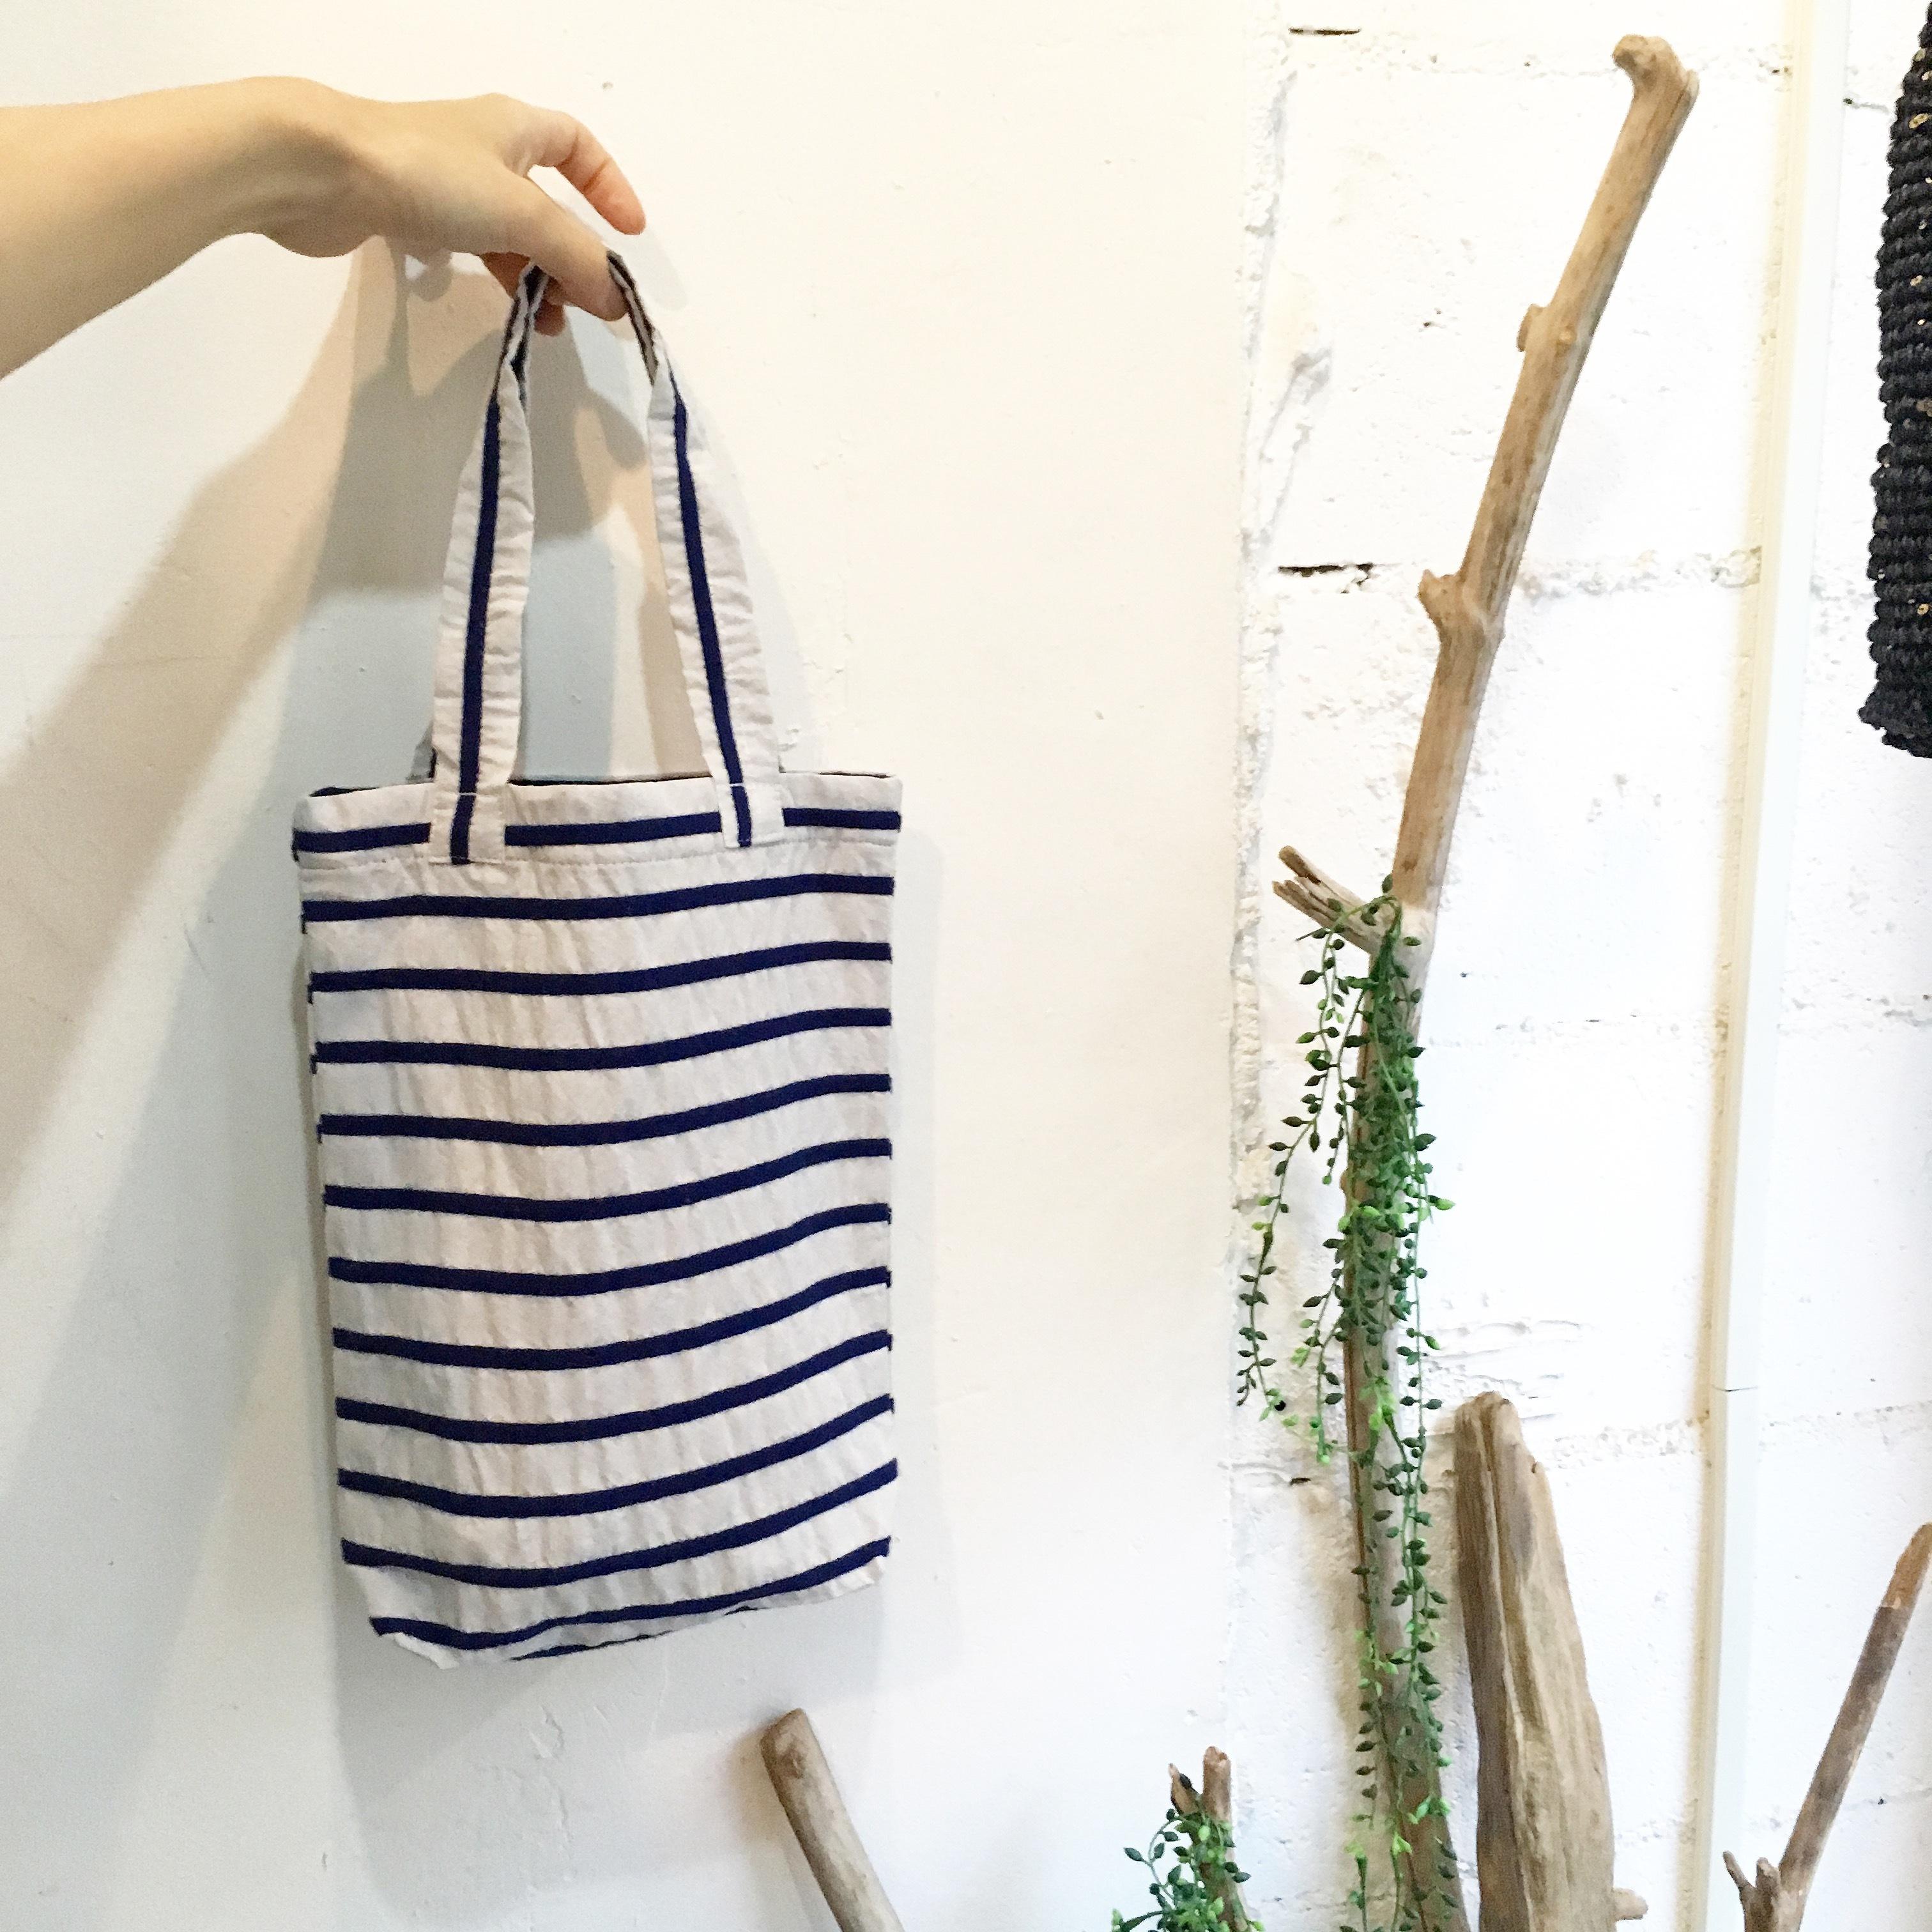 【maco】トートbag Sサイズ(青ボーダー)